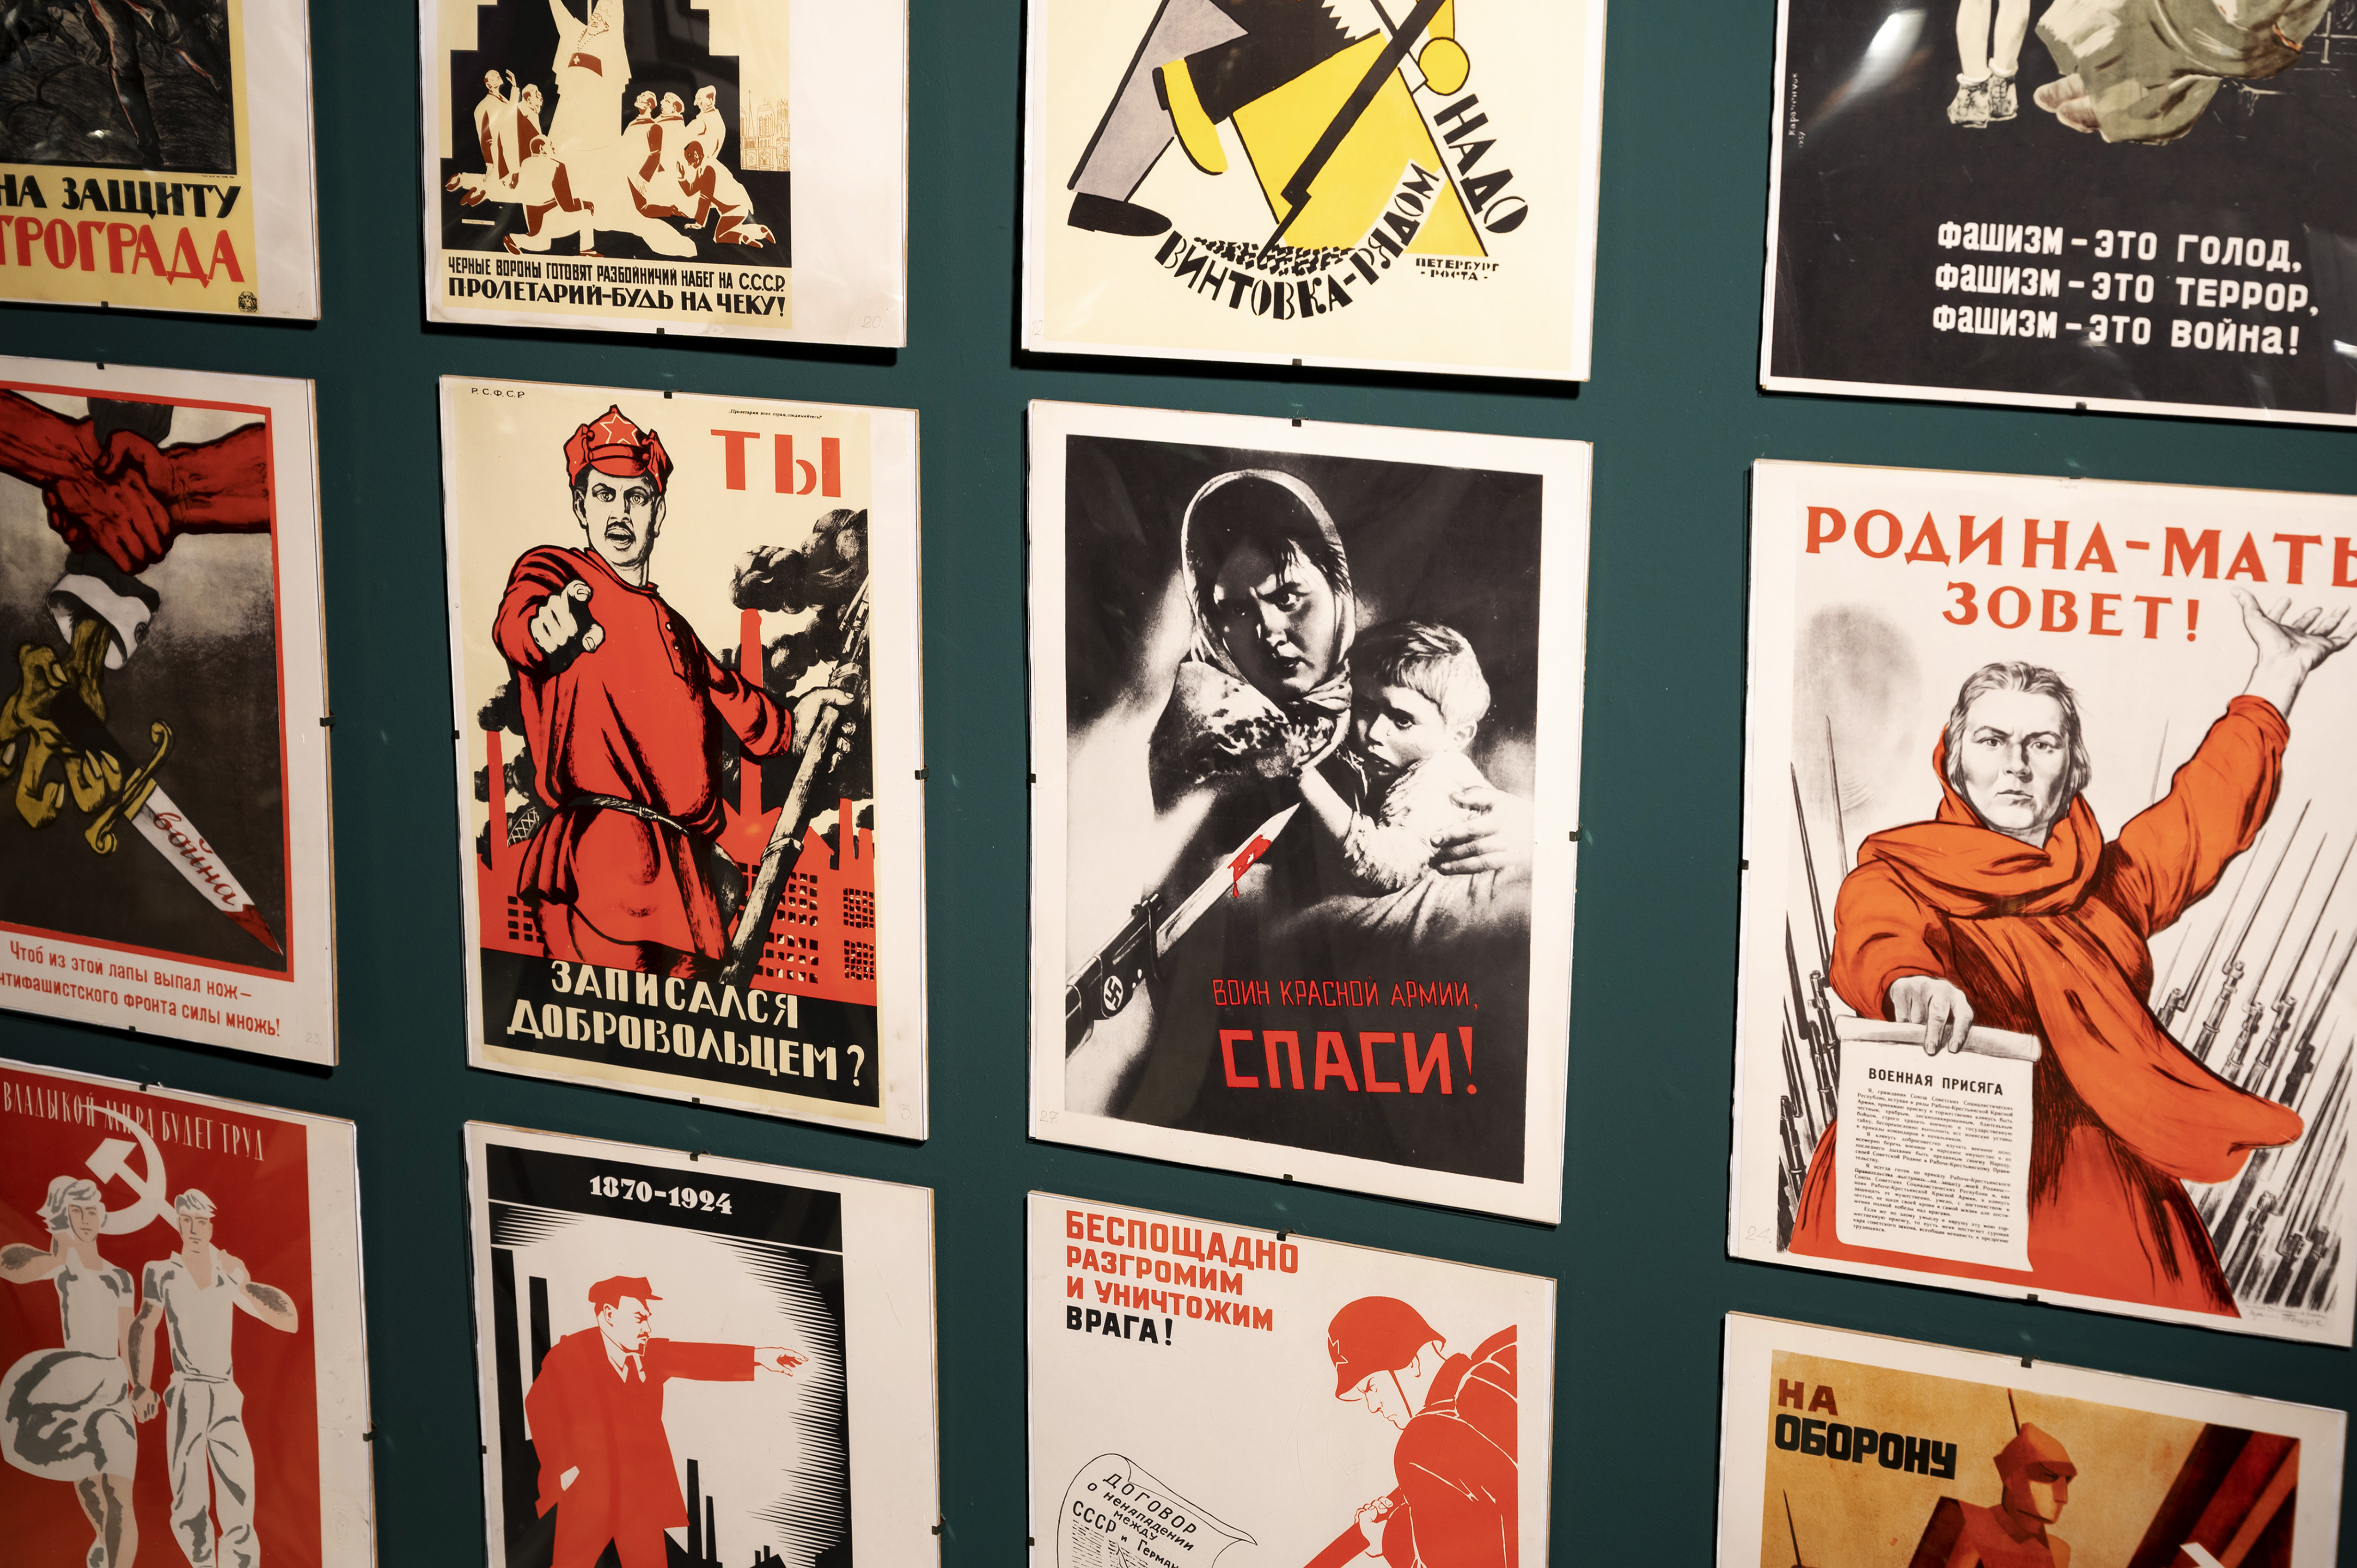 Soviet propaganda posters adorn a wall in the KGB Spy Museum.